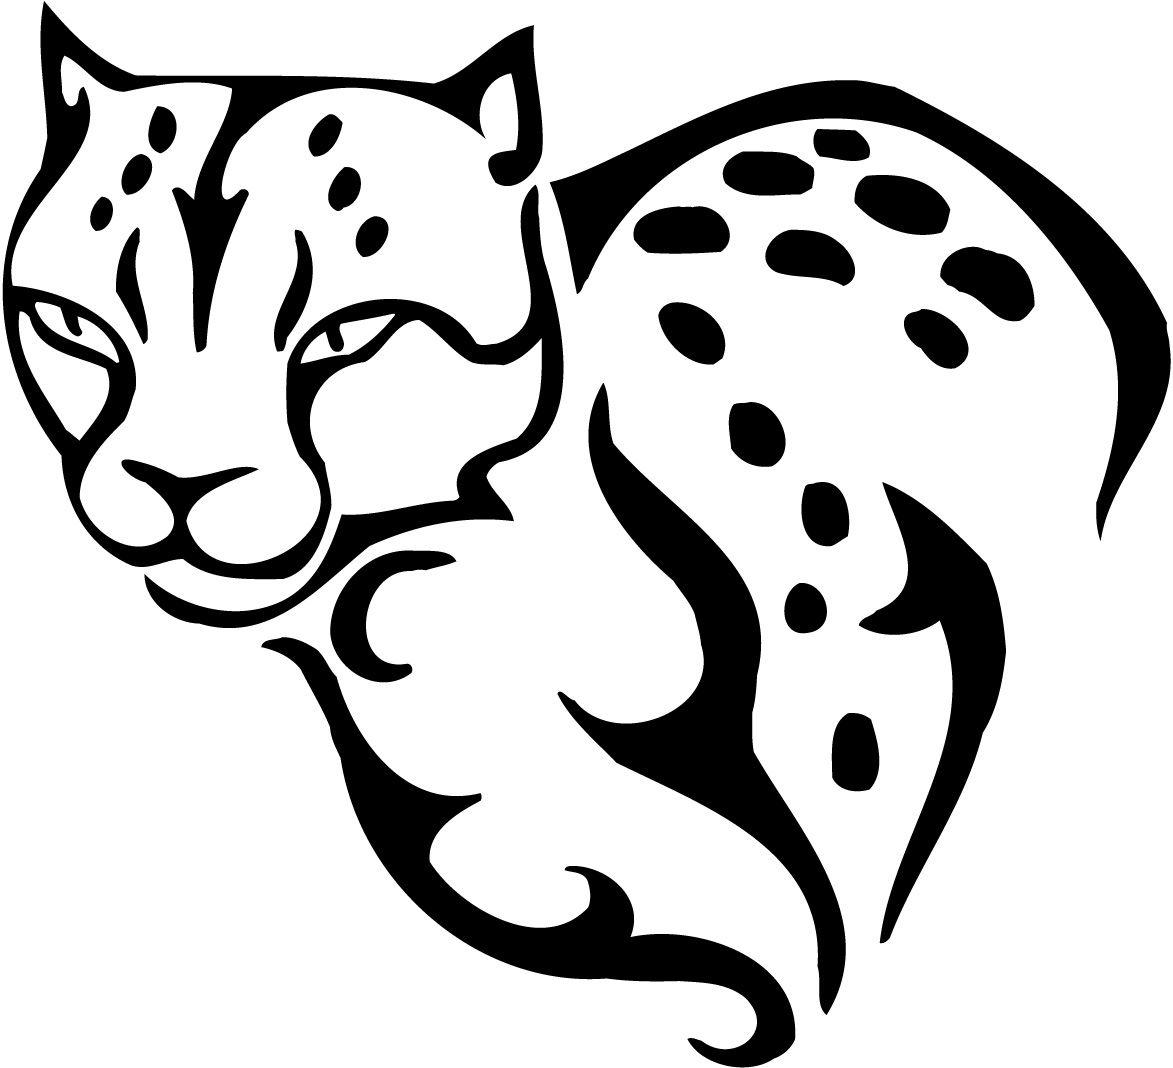 Big Cheetah Printable Pages For Kids